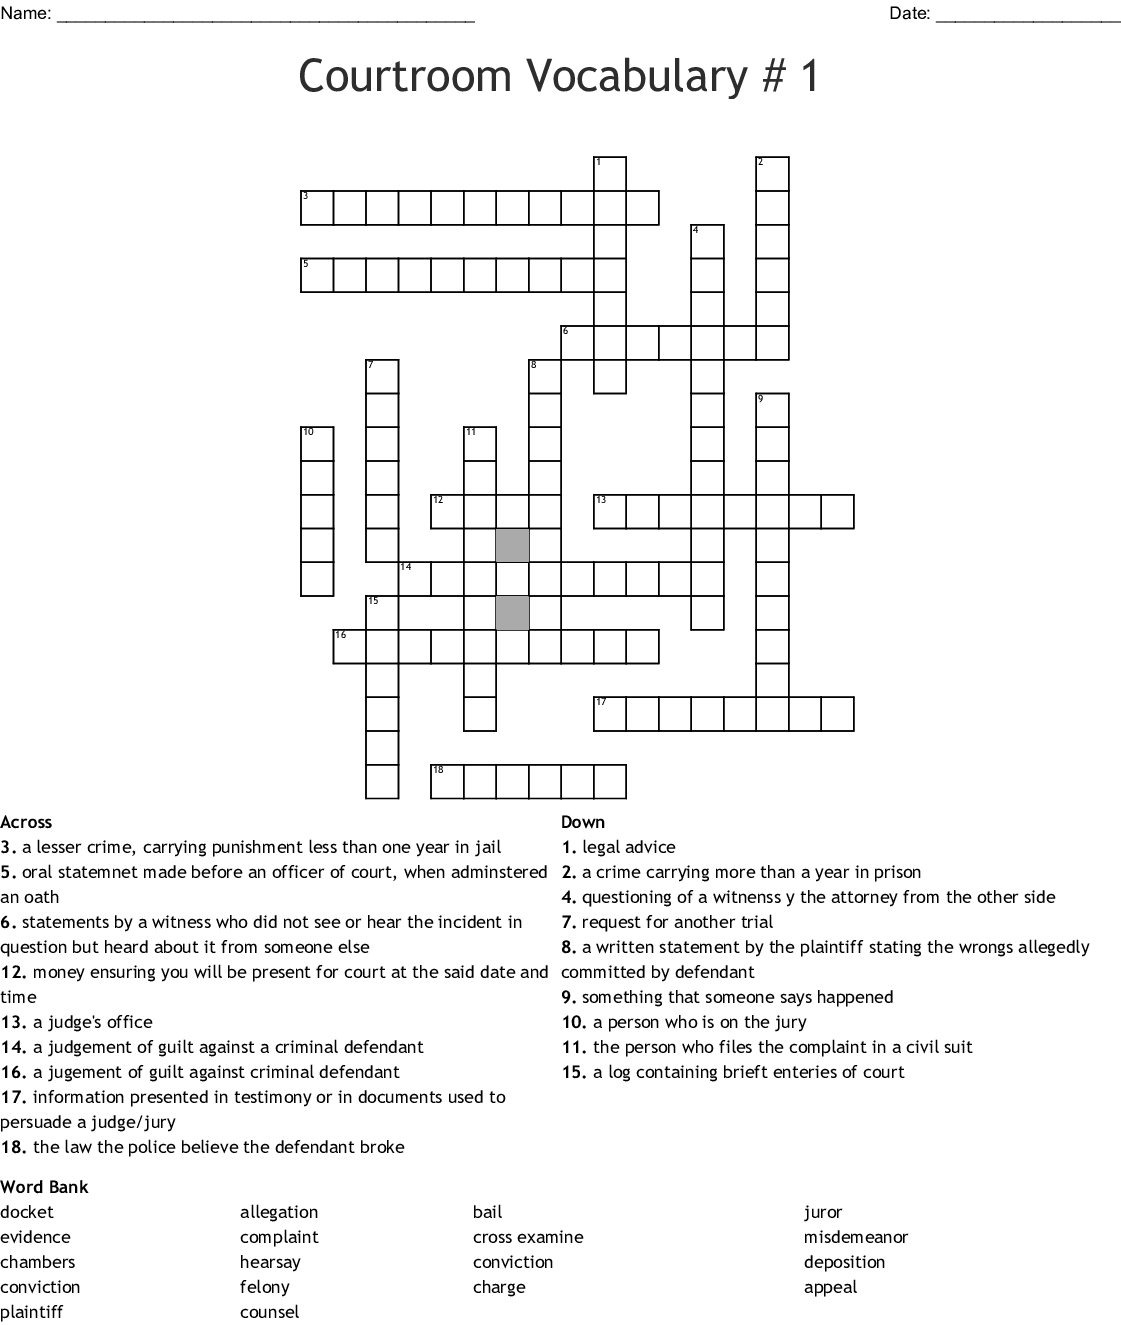 Courtroom Vocabulary 1 Crossword